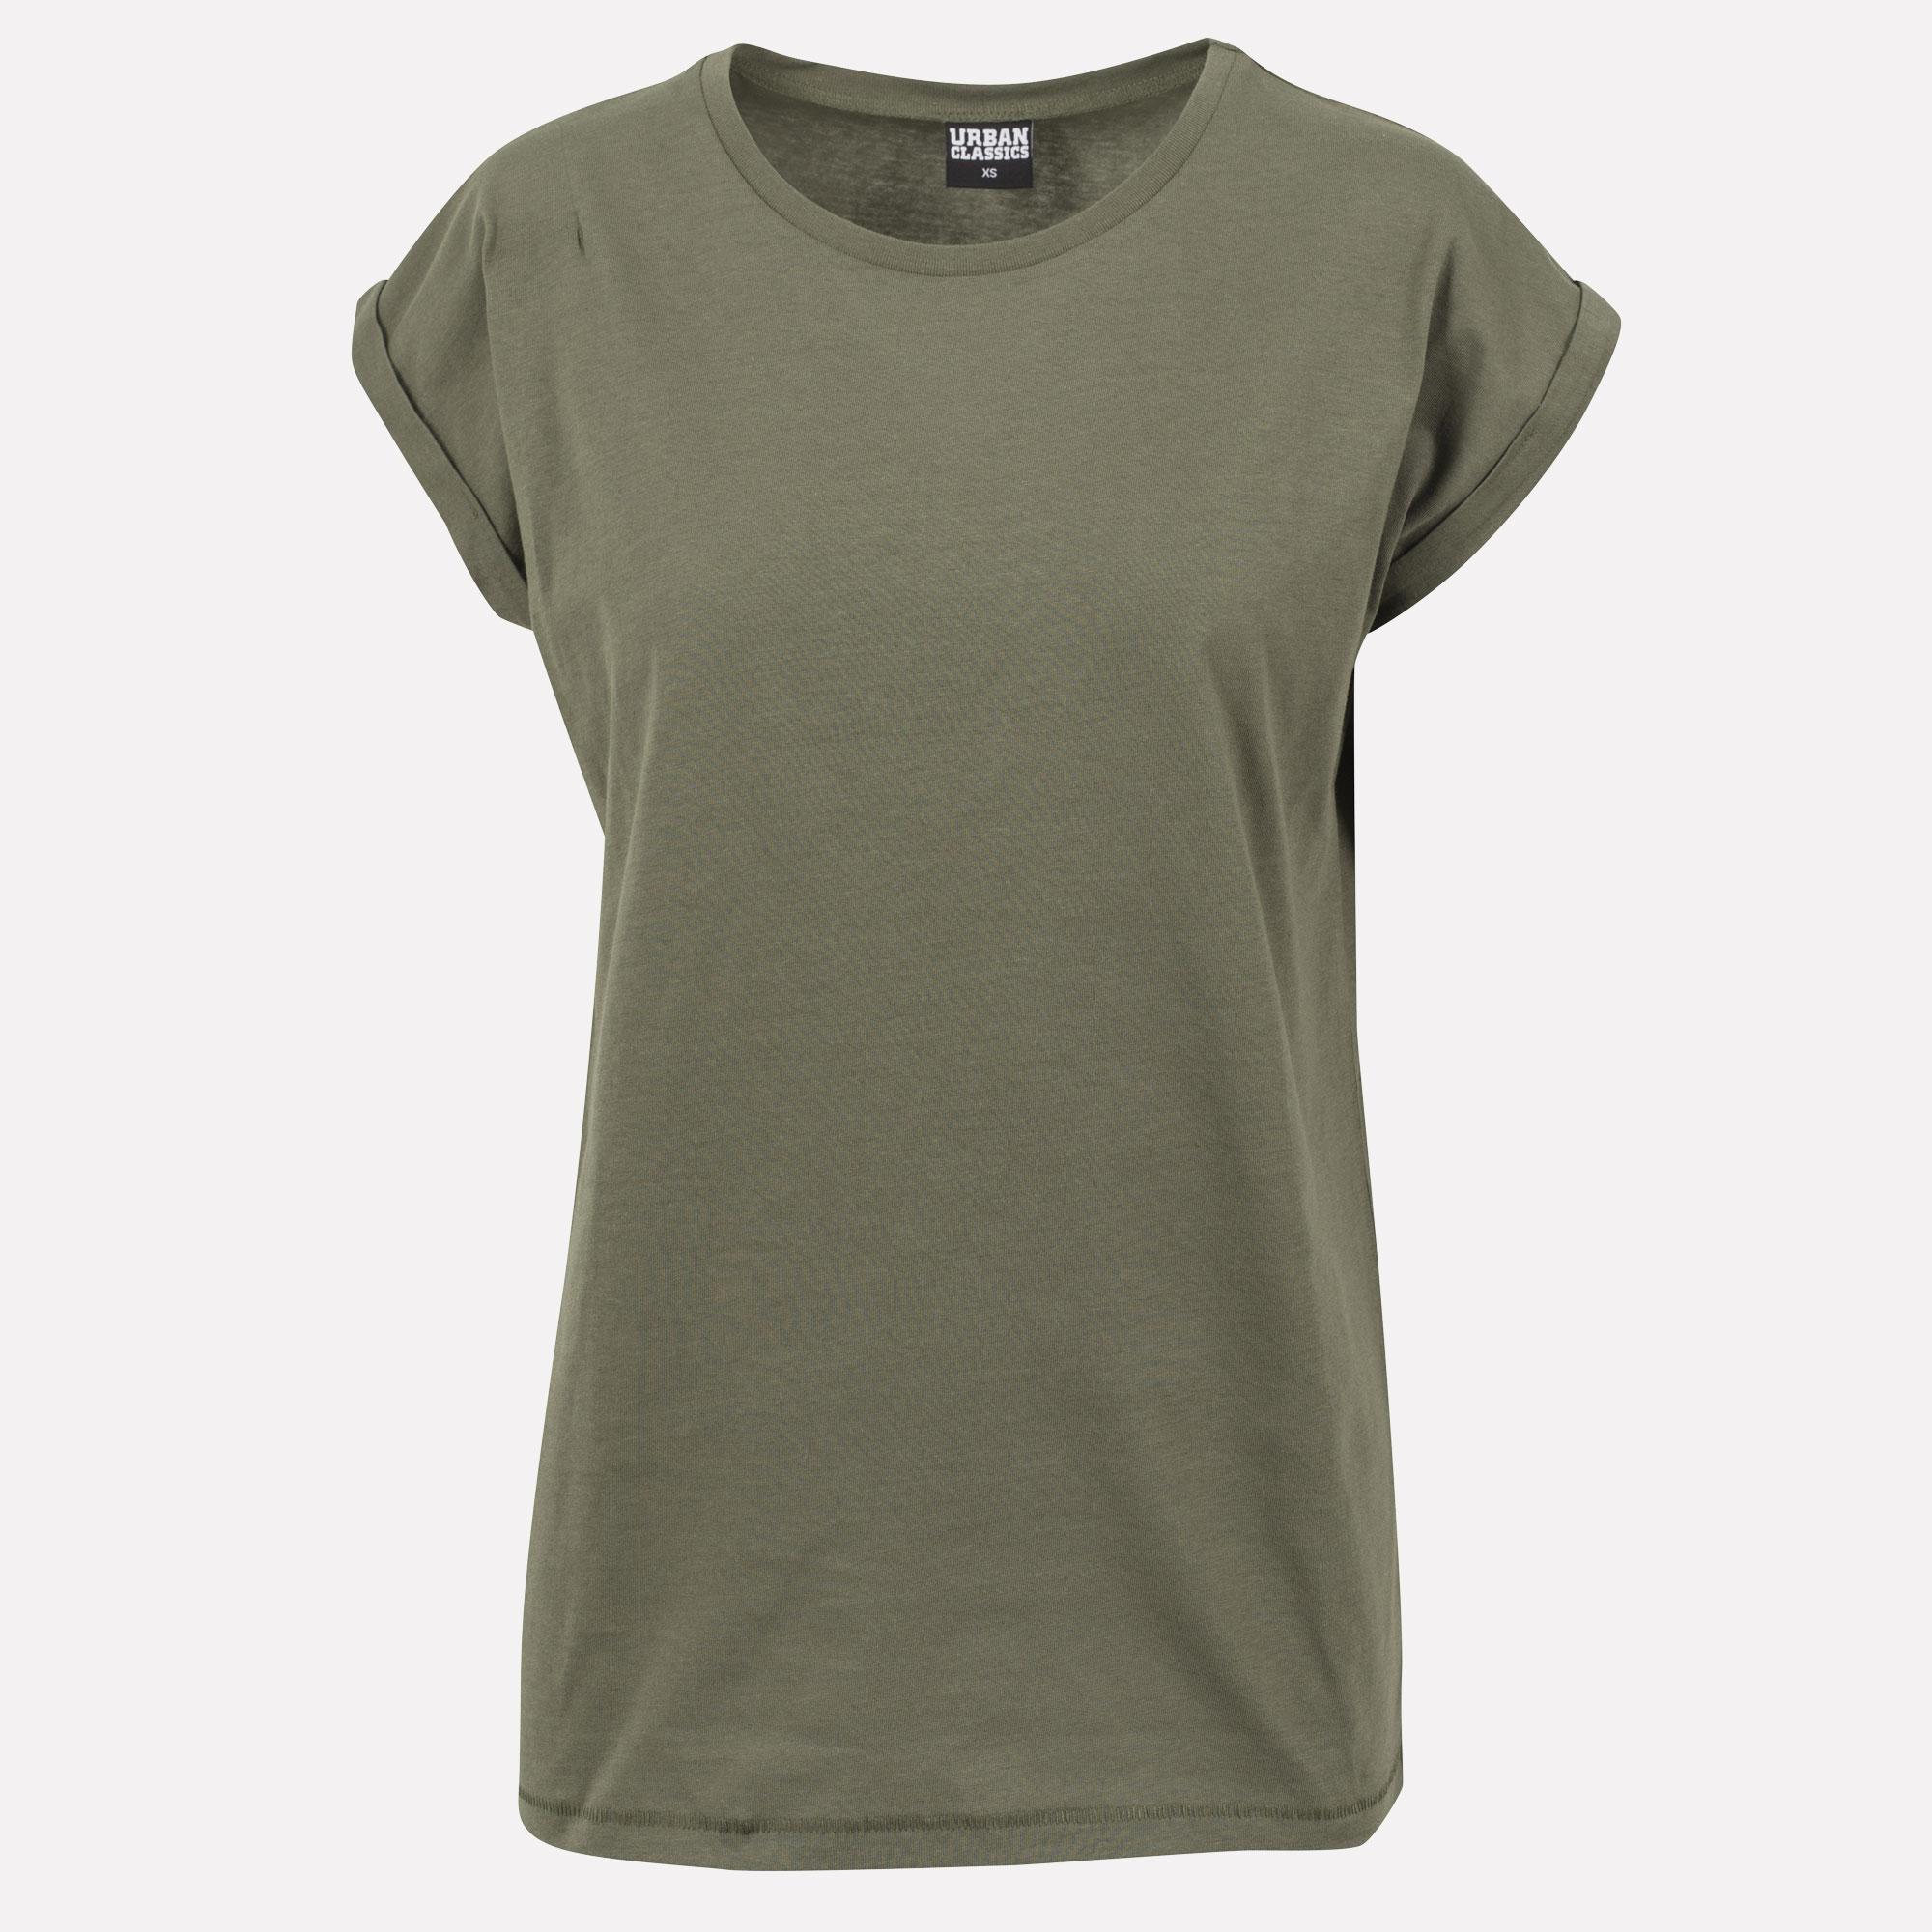 URBAN CLASSICS Damen T-shirt Shirt loose tee basic weiß schwarz grau TB771